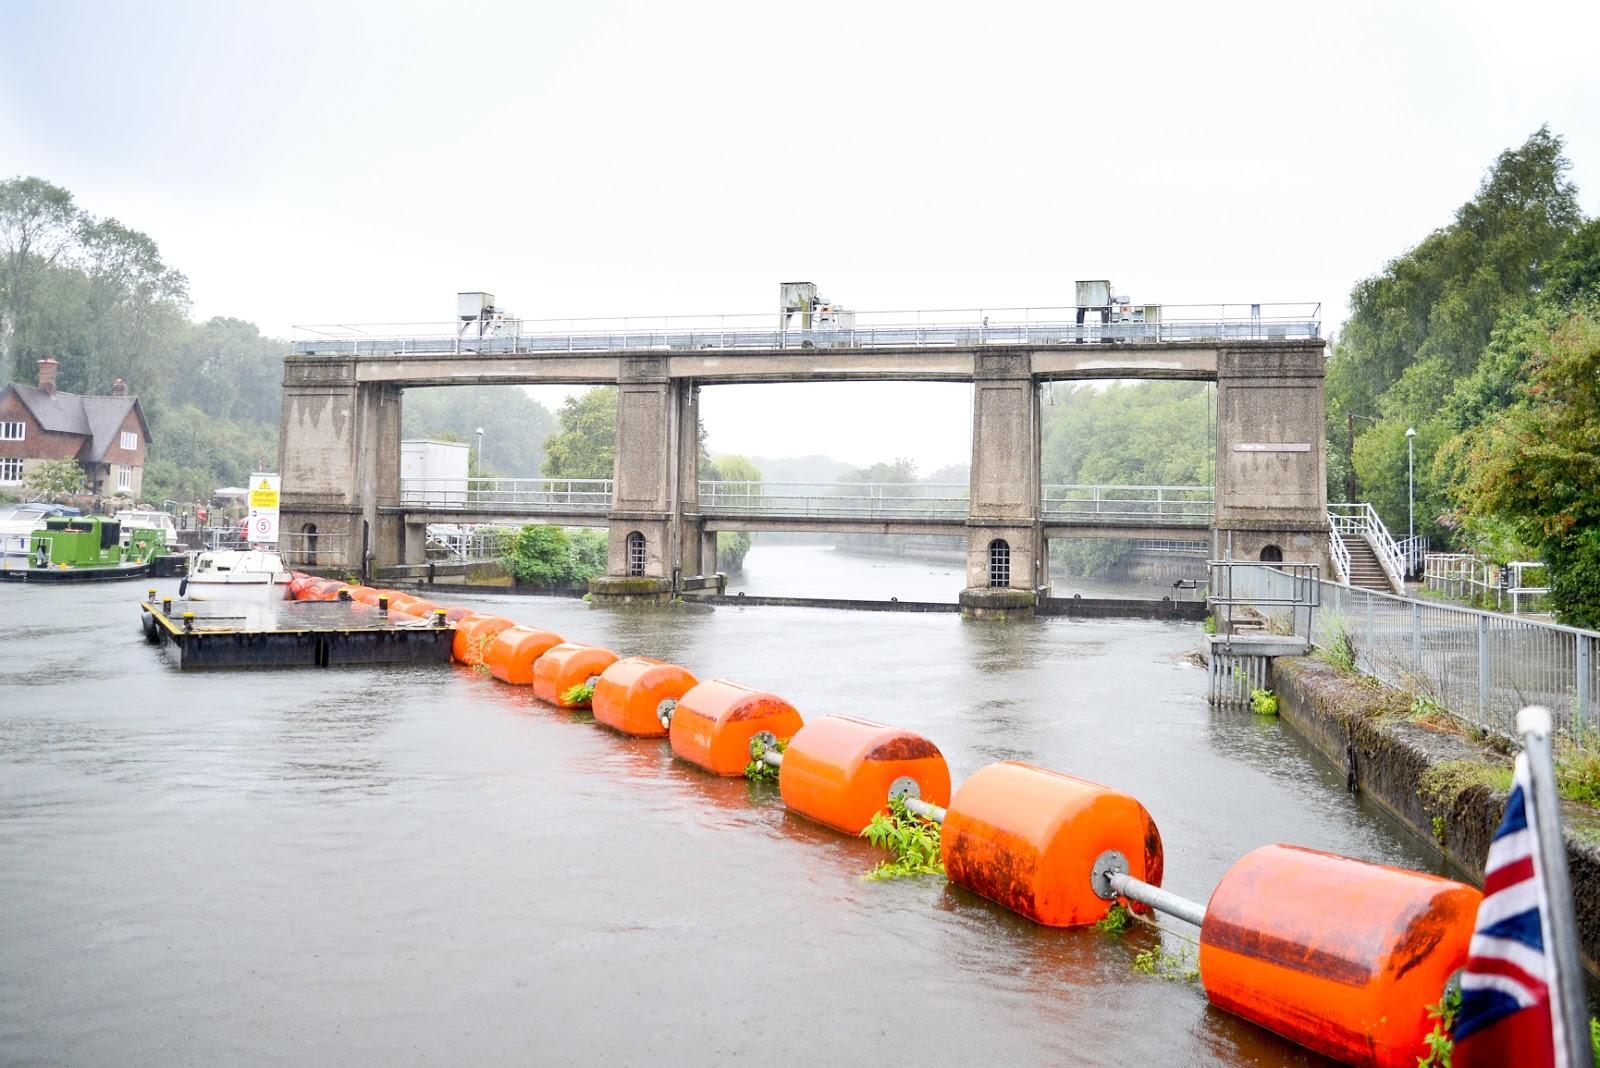 allington lock,